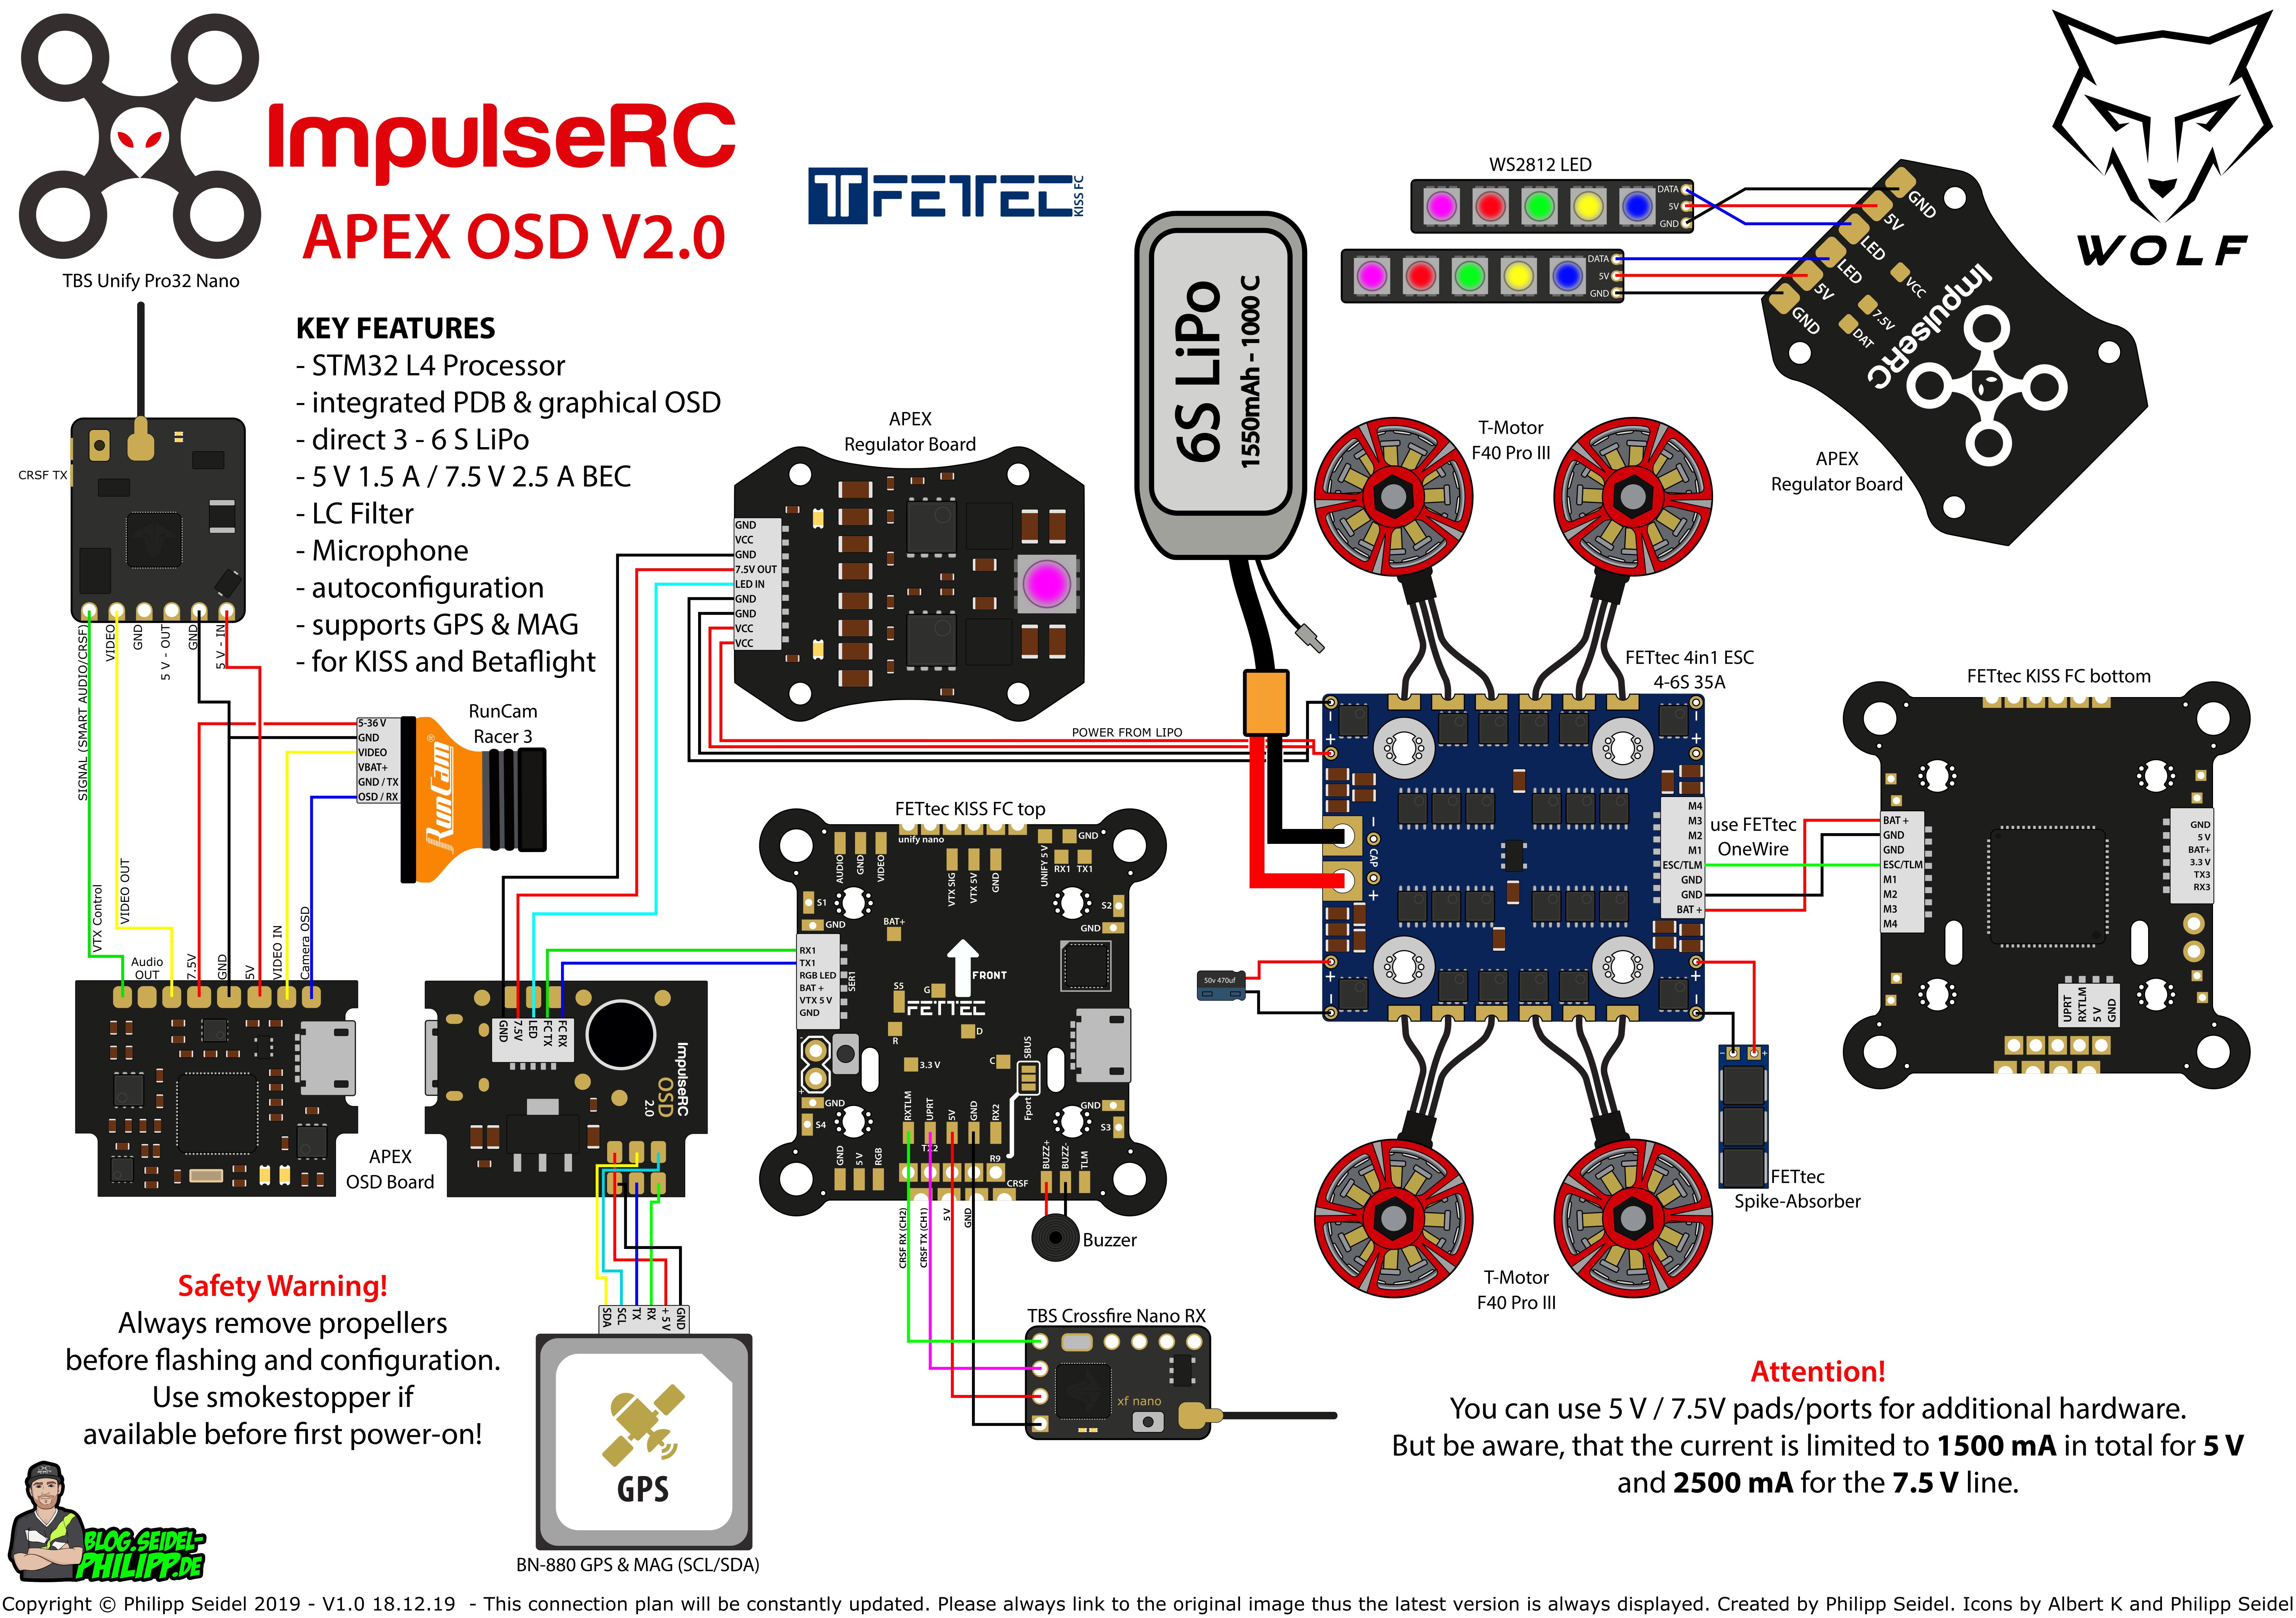 Connection plan for the ImpulseRC Apex OSD V2.0 and FETTec KISS FC. Anschlussplan zum ImpulseRC Apex OSD V2.0 und FETTec KISS FC